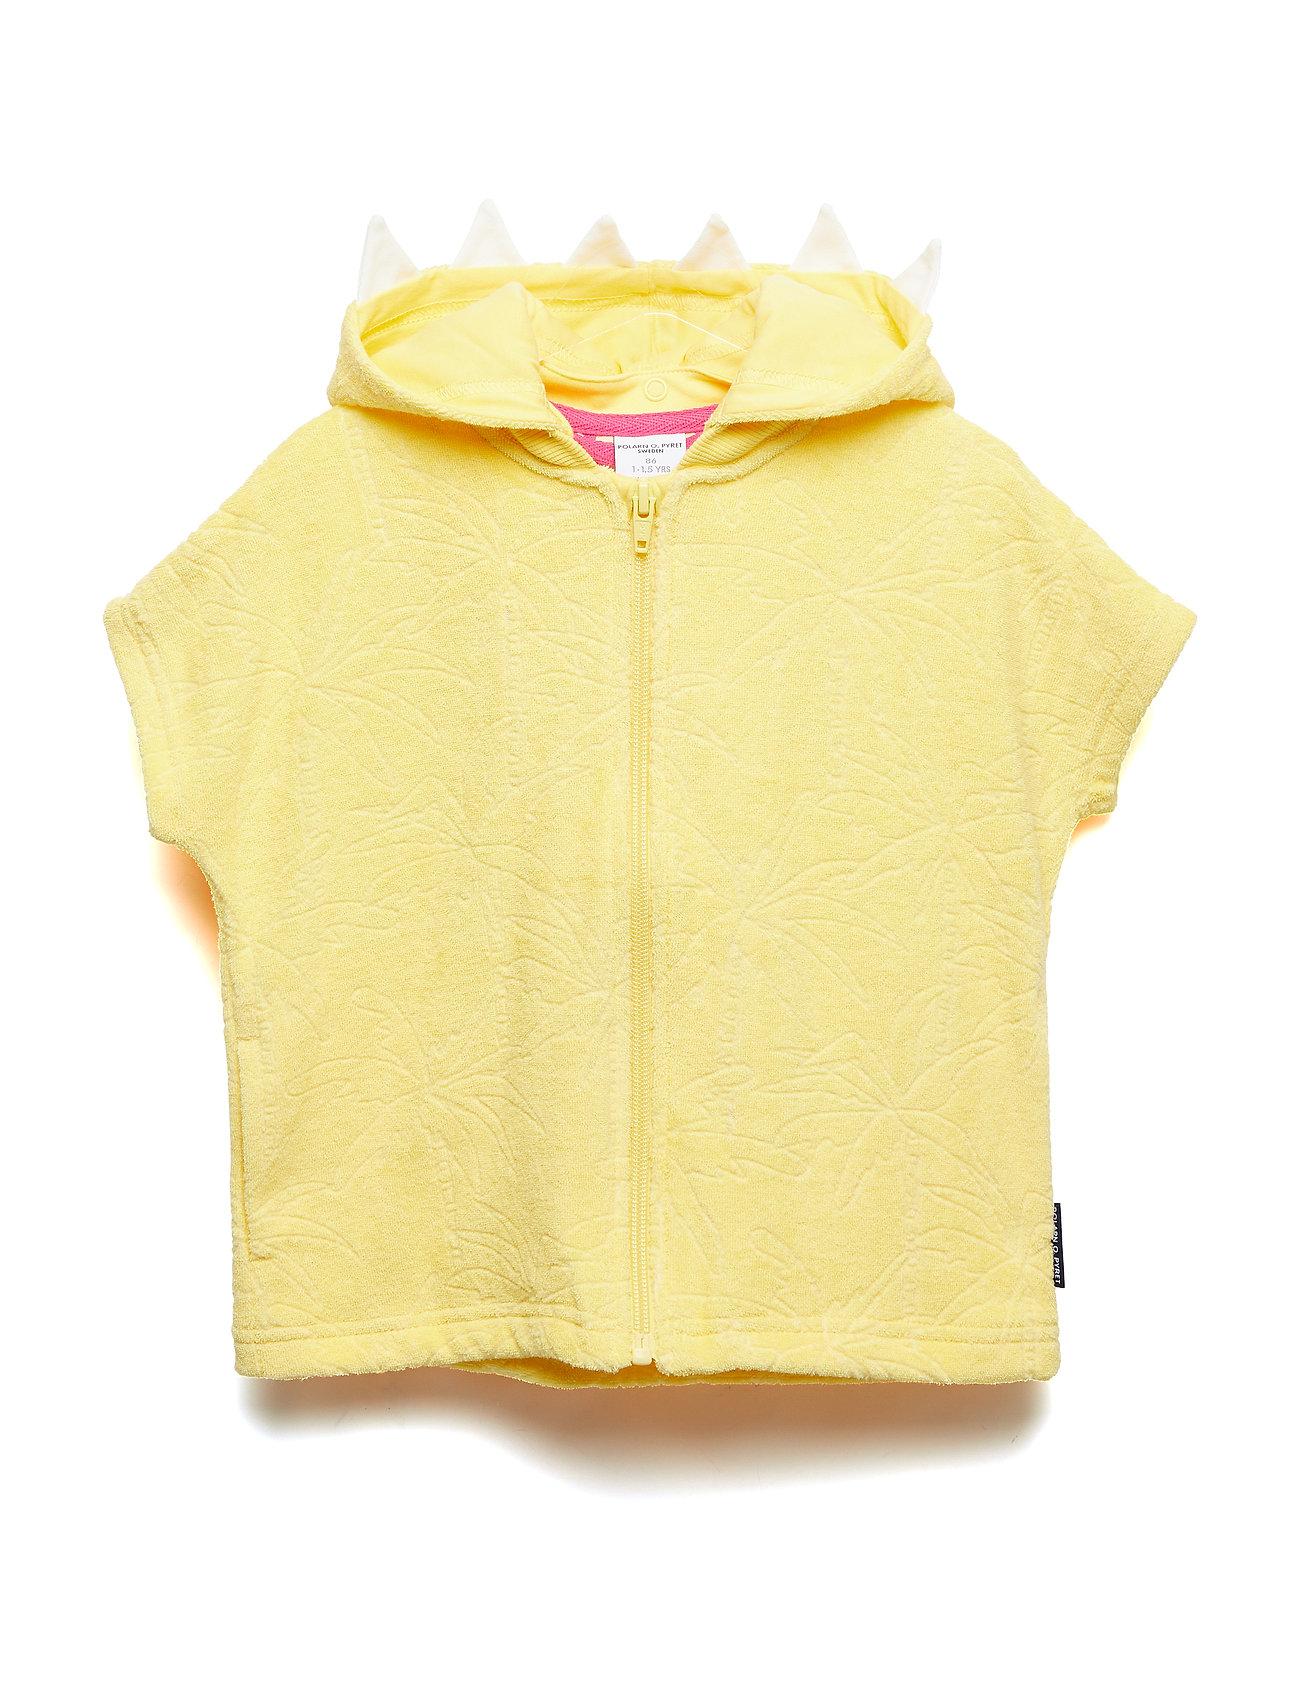 Polarn O. Pyret Sweatshirt Hood Zipper Preschool